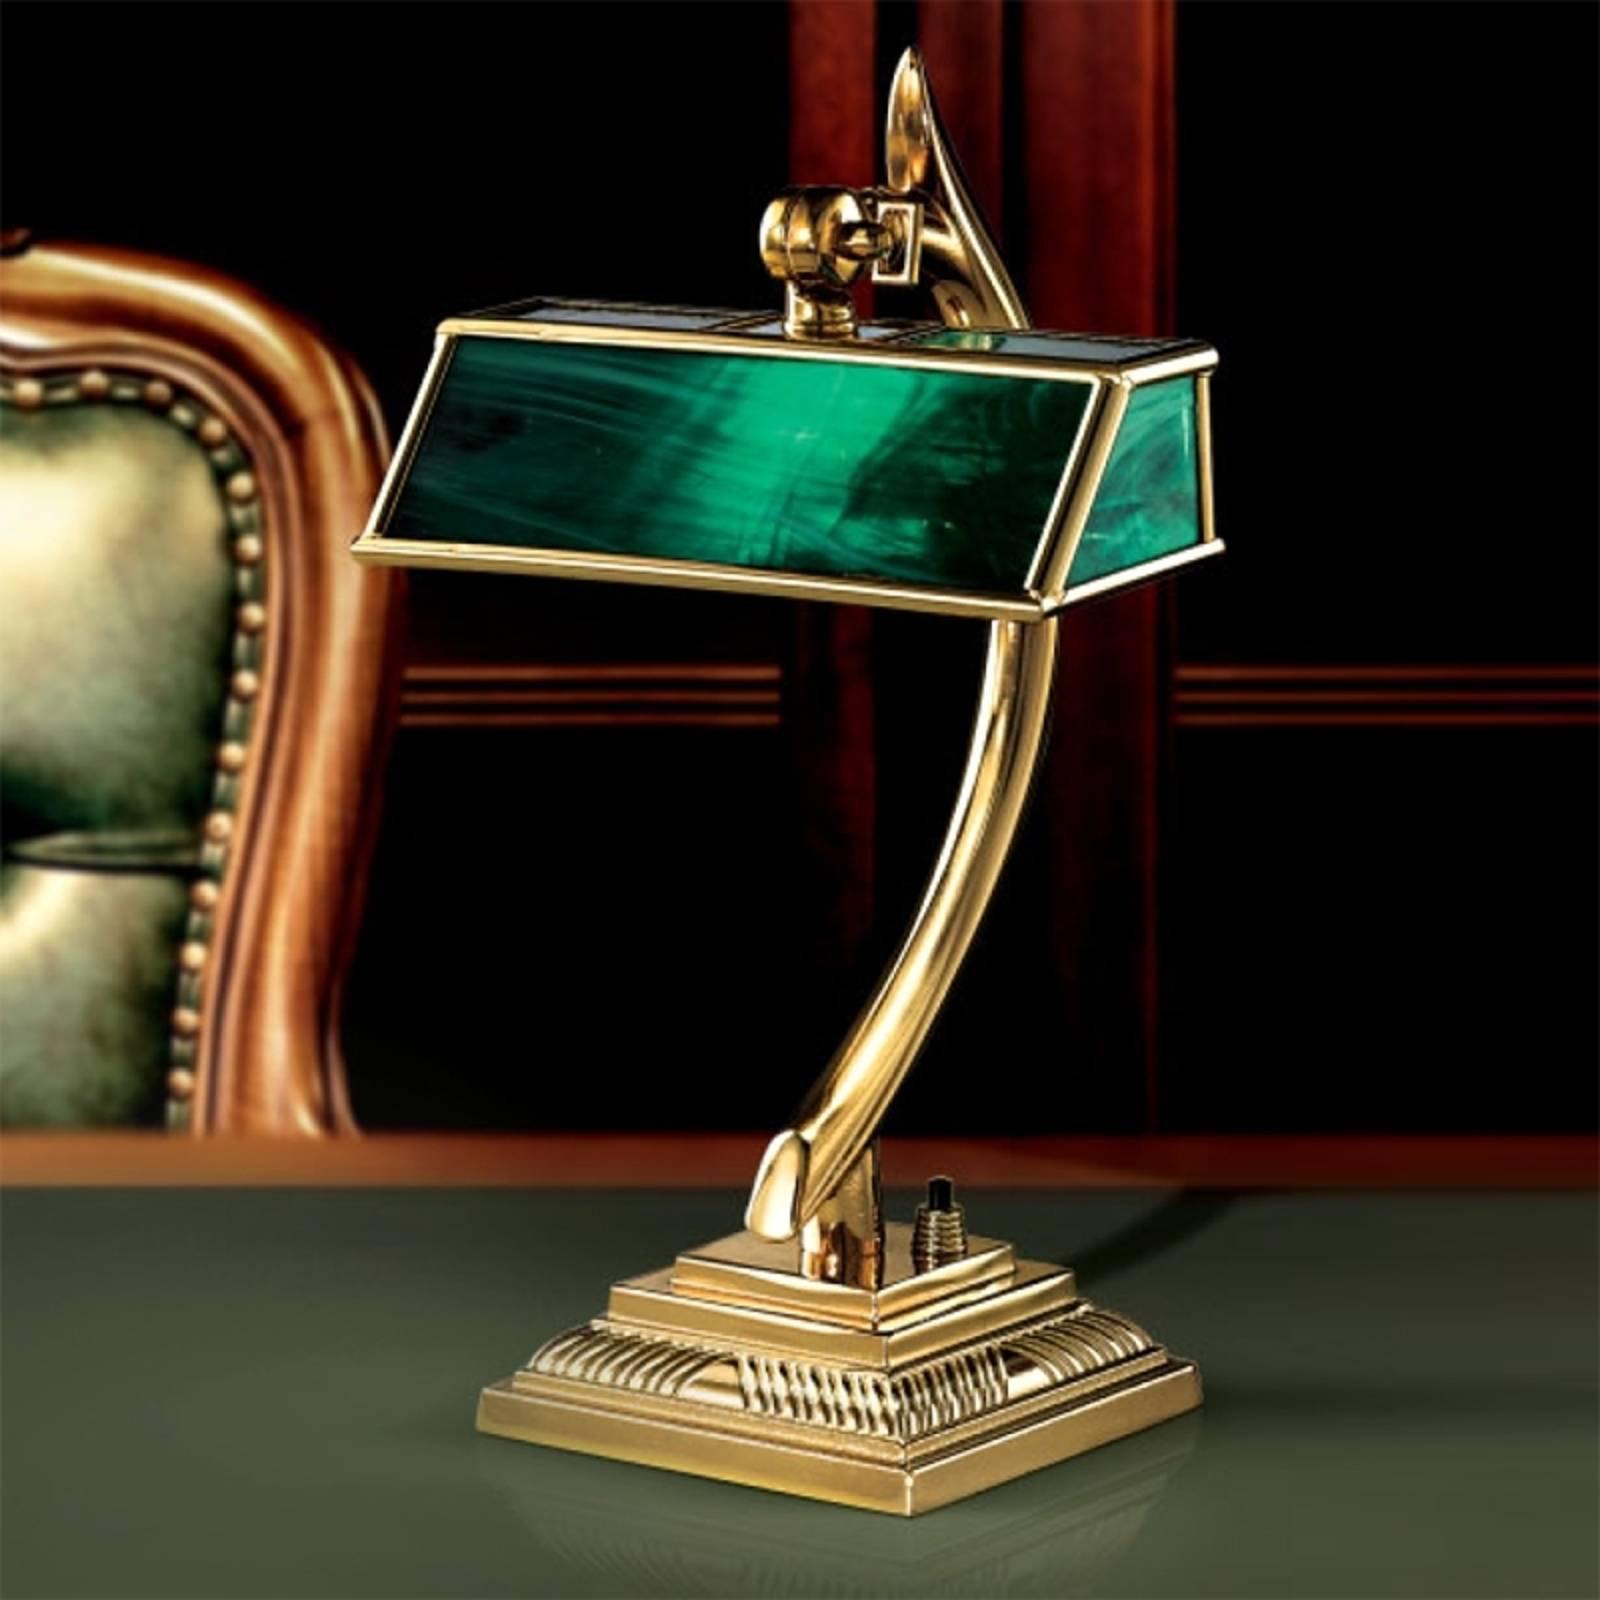 Representativ Antiko bordlampe